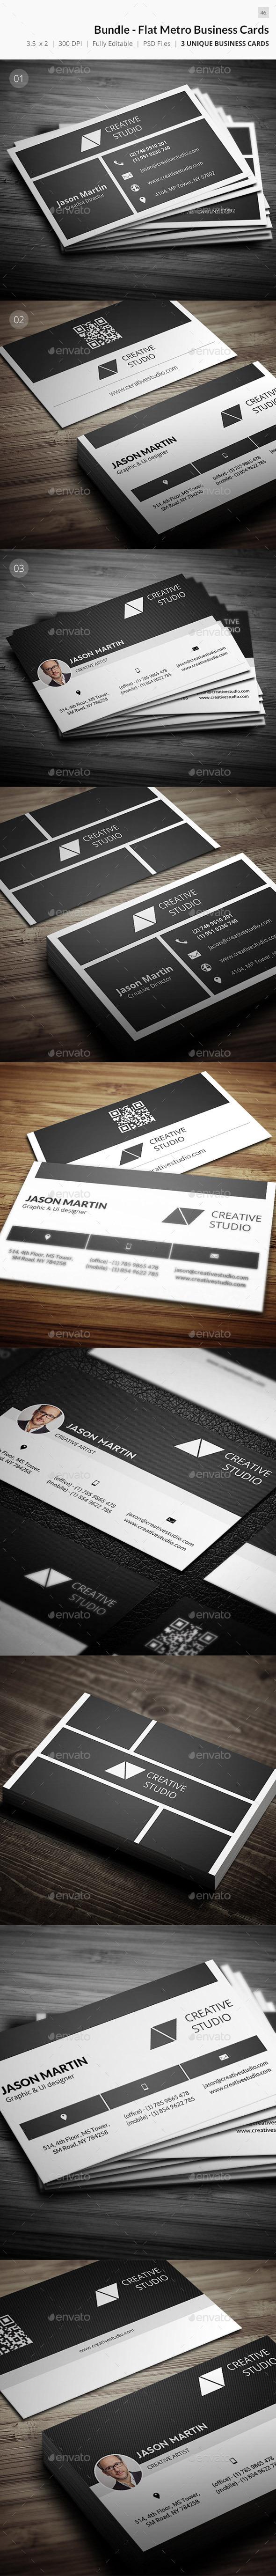 Bundle - Flat Metro Business Card - 46 - Creative Business Cards